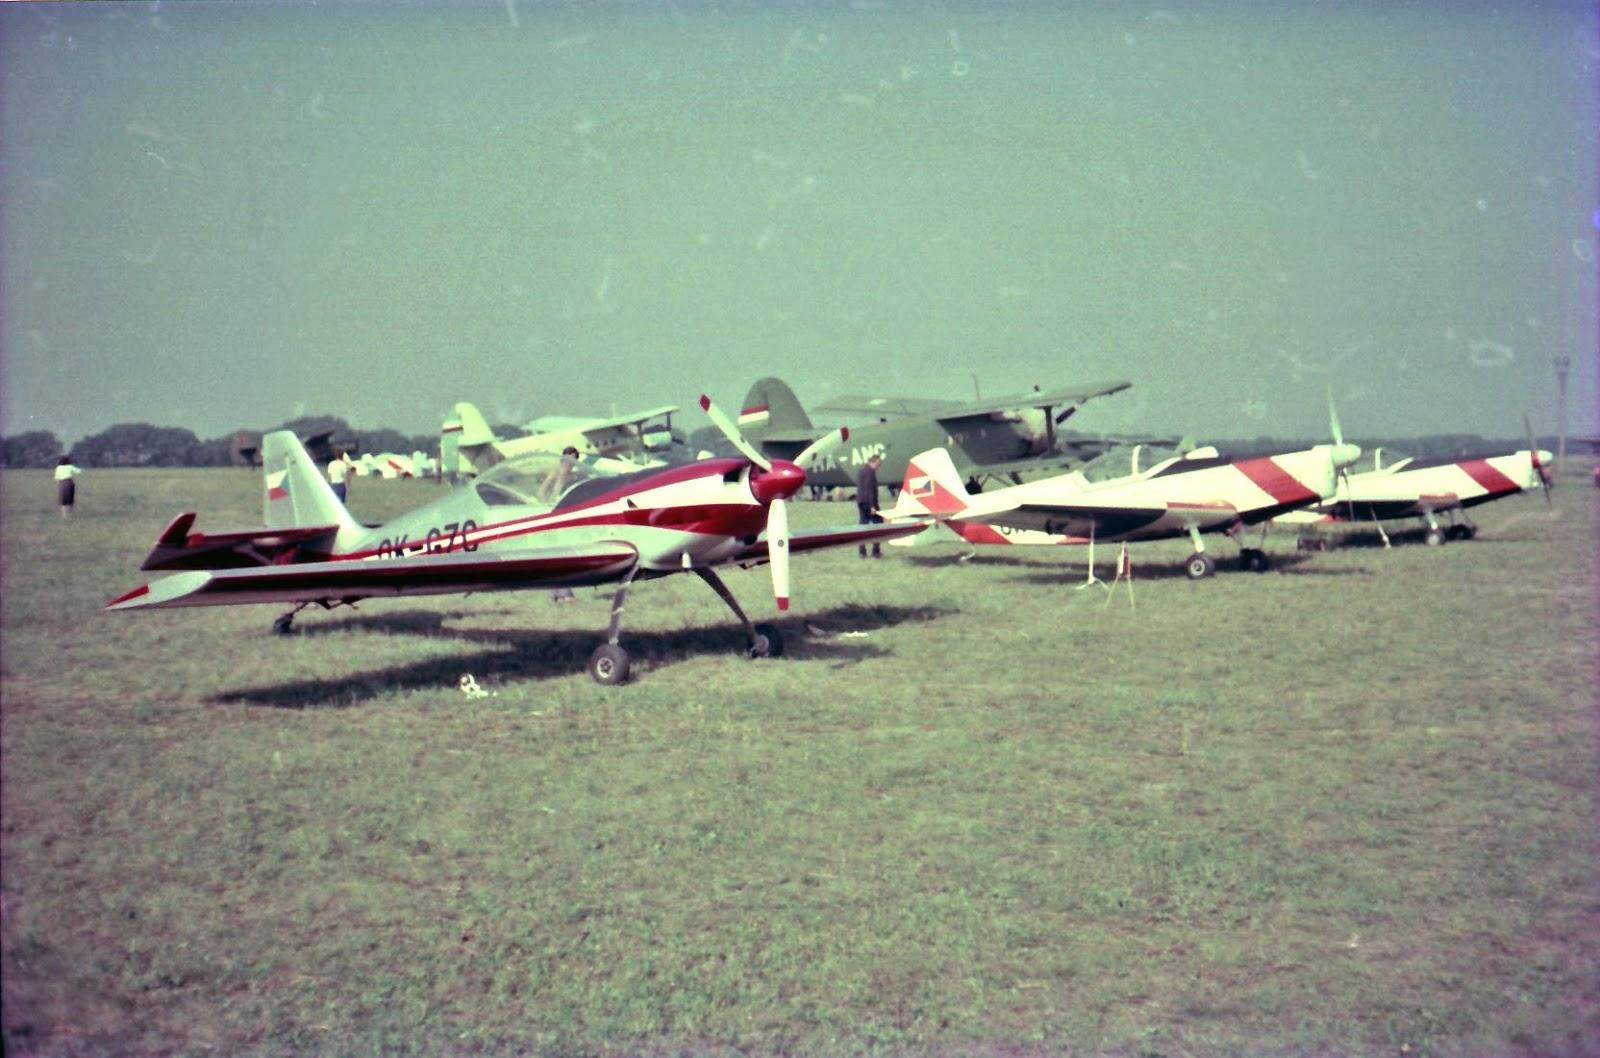 Curtis Pitts Special 3er set//avion//Aircraft//yakair remove bevore Flight